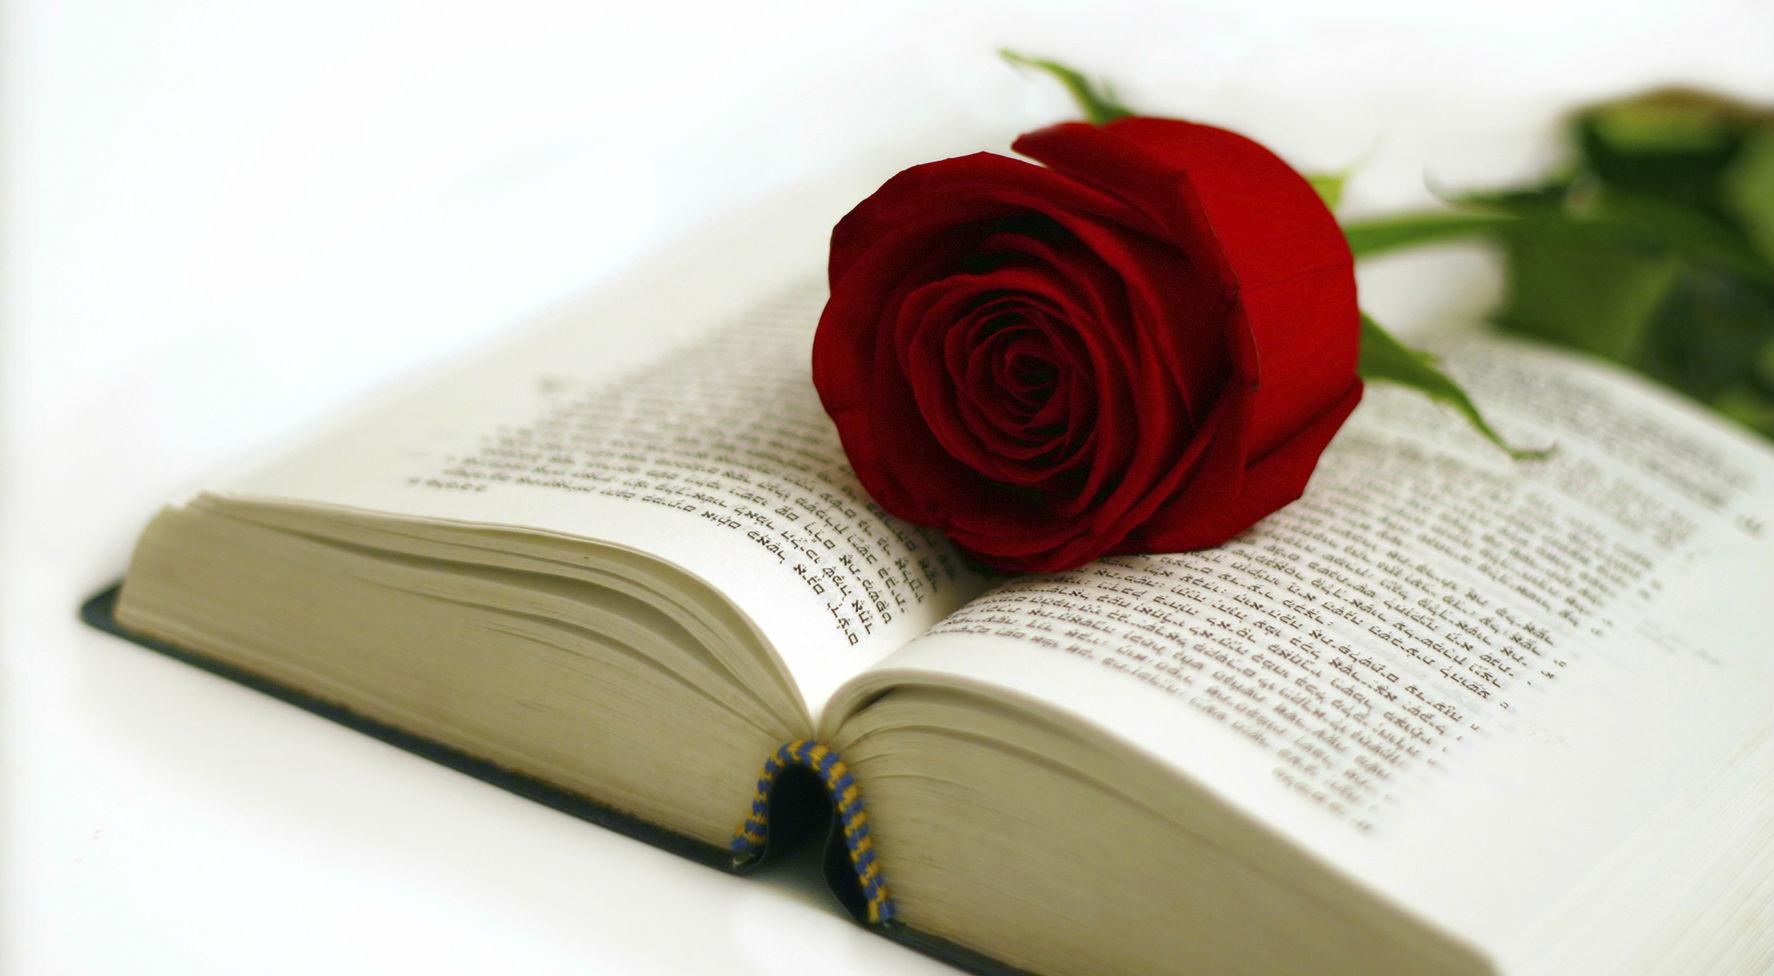 23 Aprile 2021 Libri & Rose